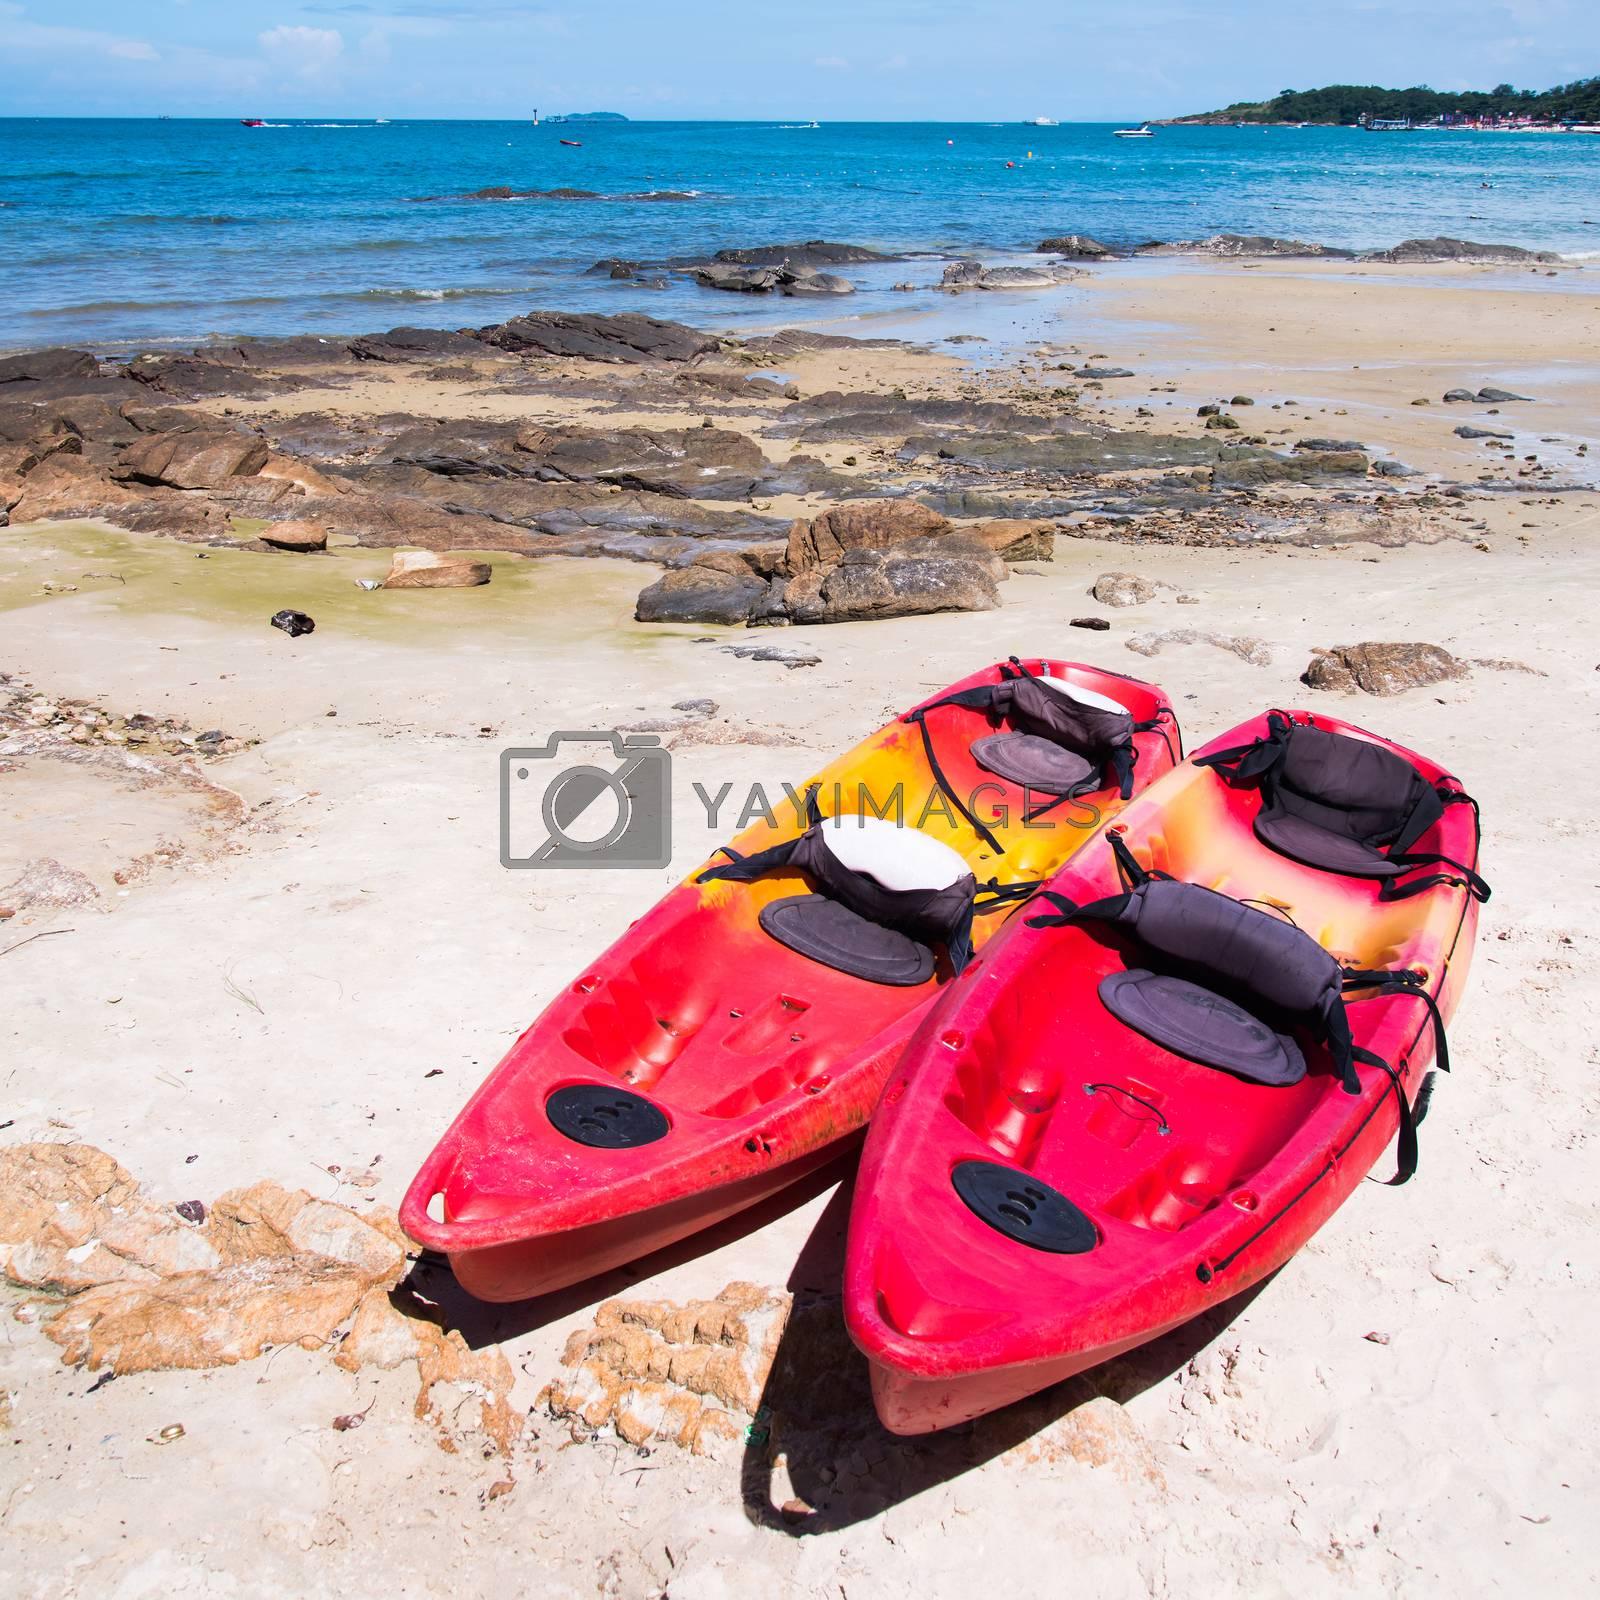 Kayaks on the tropical beach, Mu Koh Samet - Khao Laem Ya National Park, Rayong, Gulf of Thailand coast